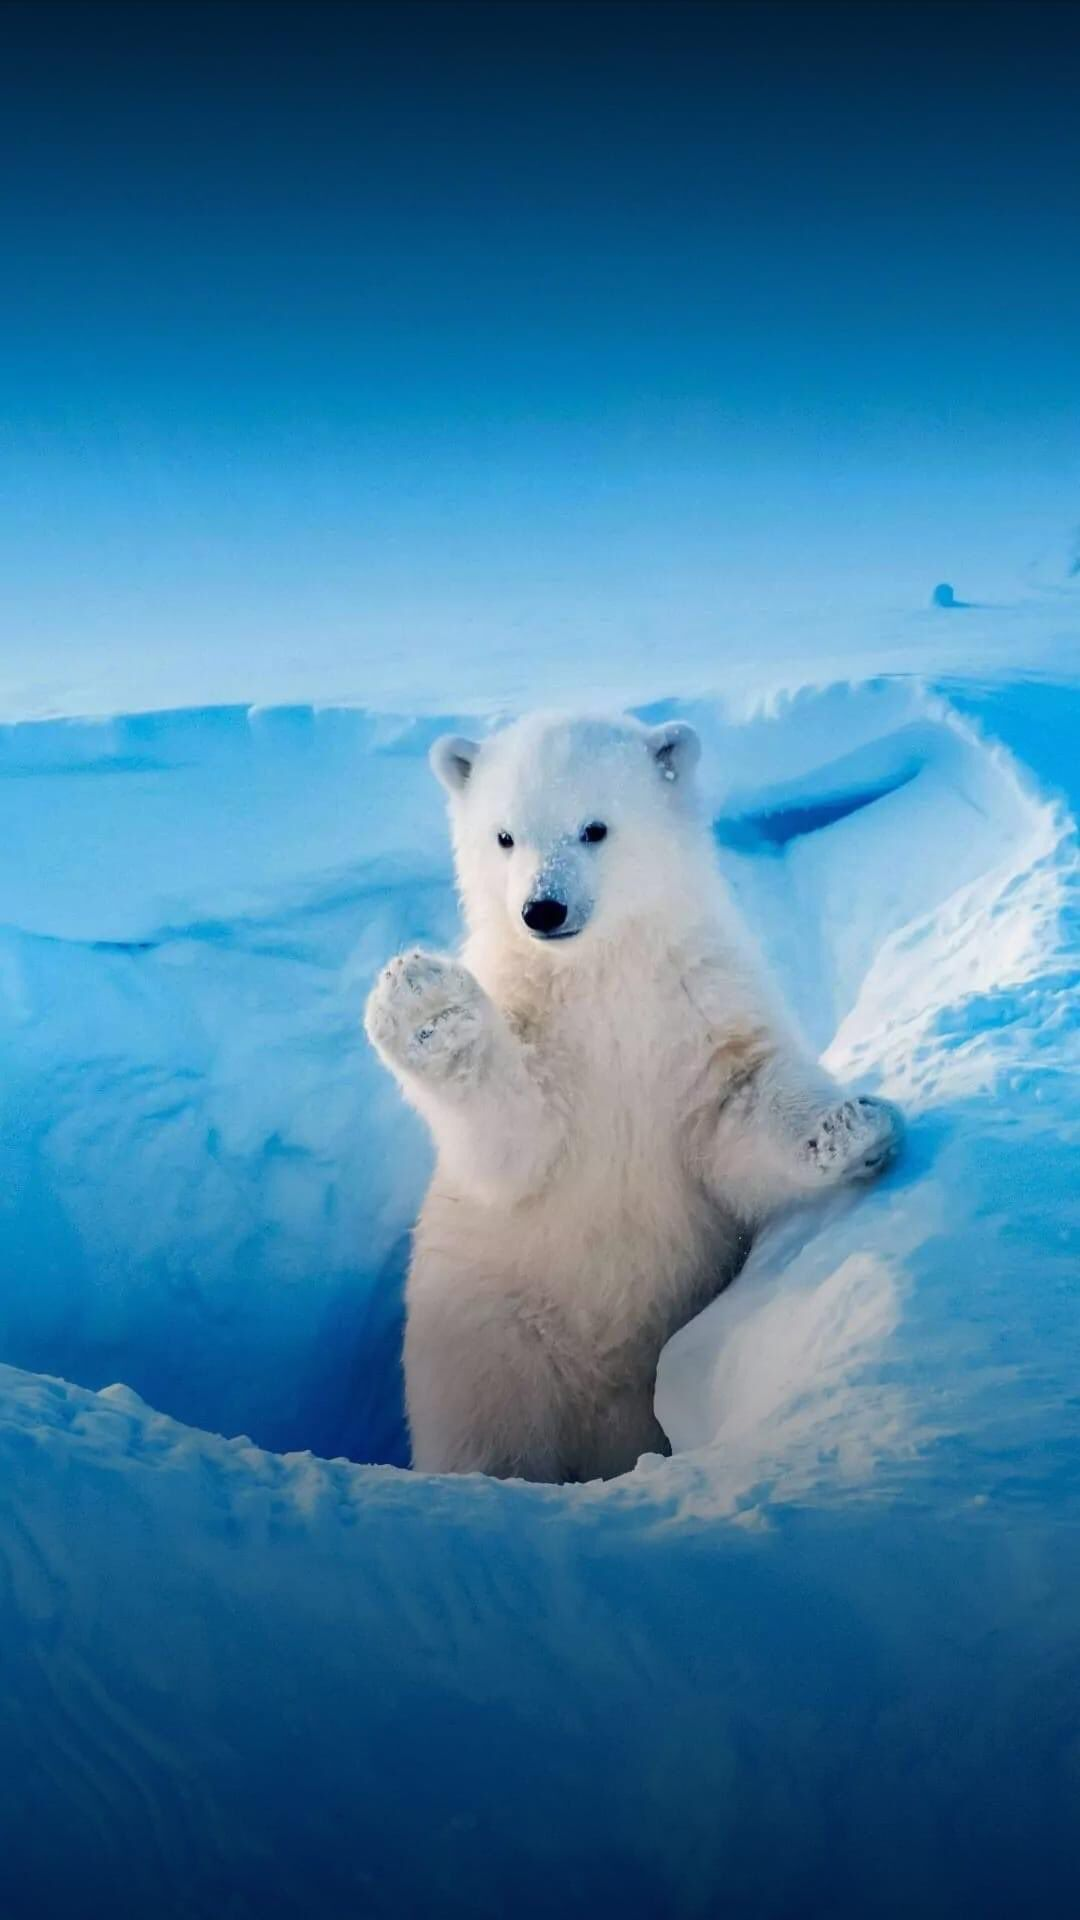 Patty On Twitter Baby Polar Bears Save The Polar Bears Cute Baby Animals